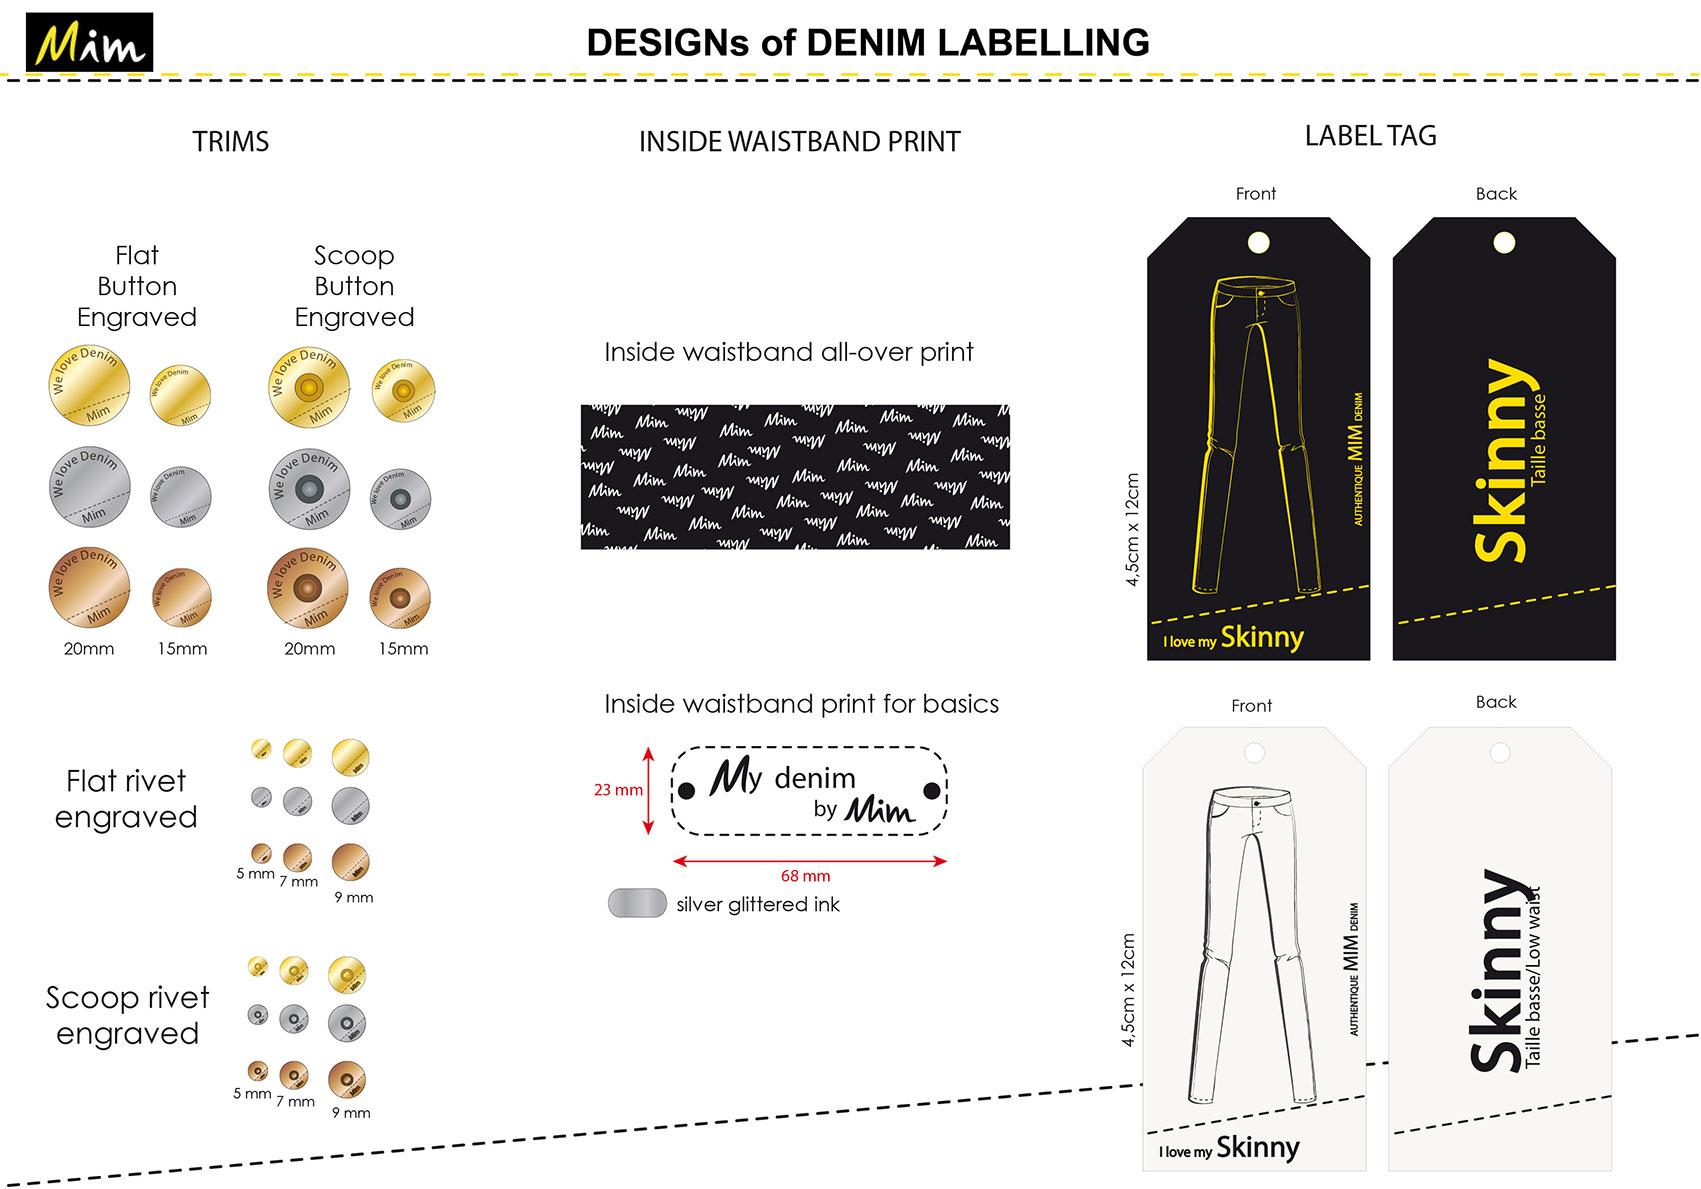 MIM denim labelling 2014.jpg